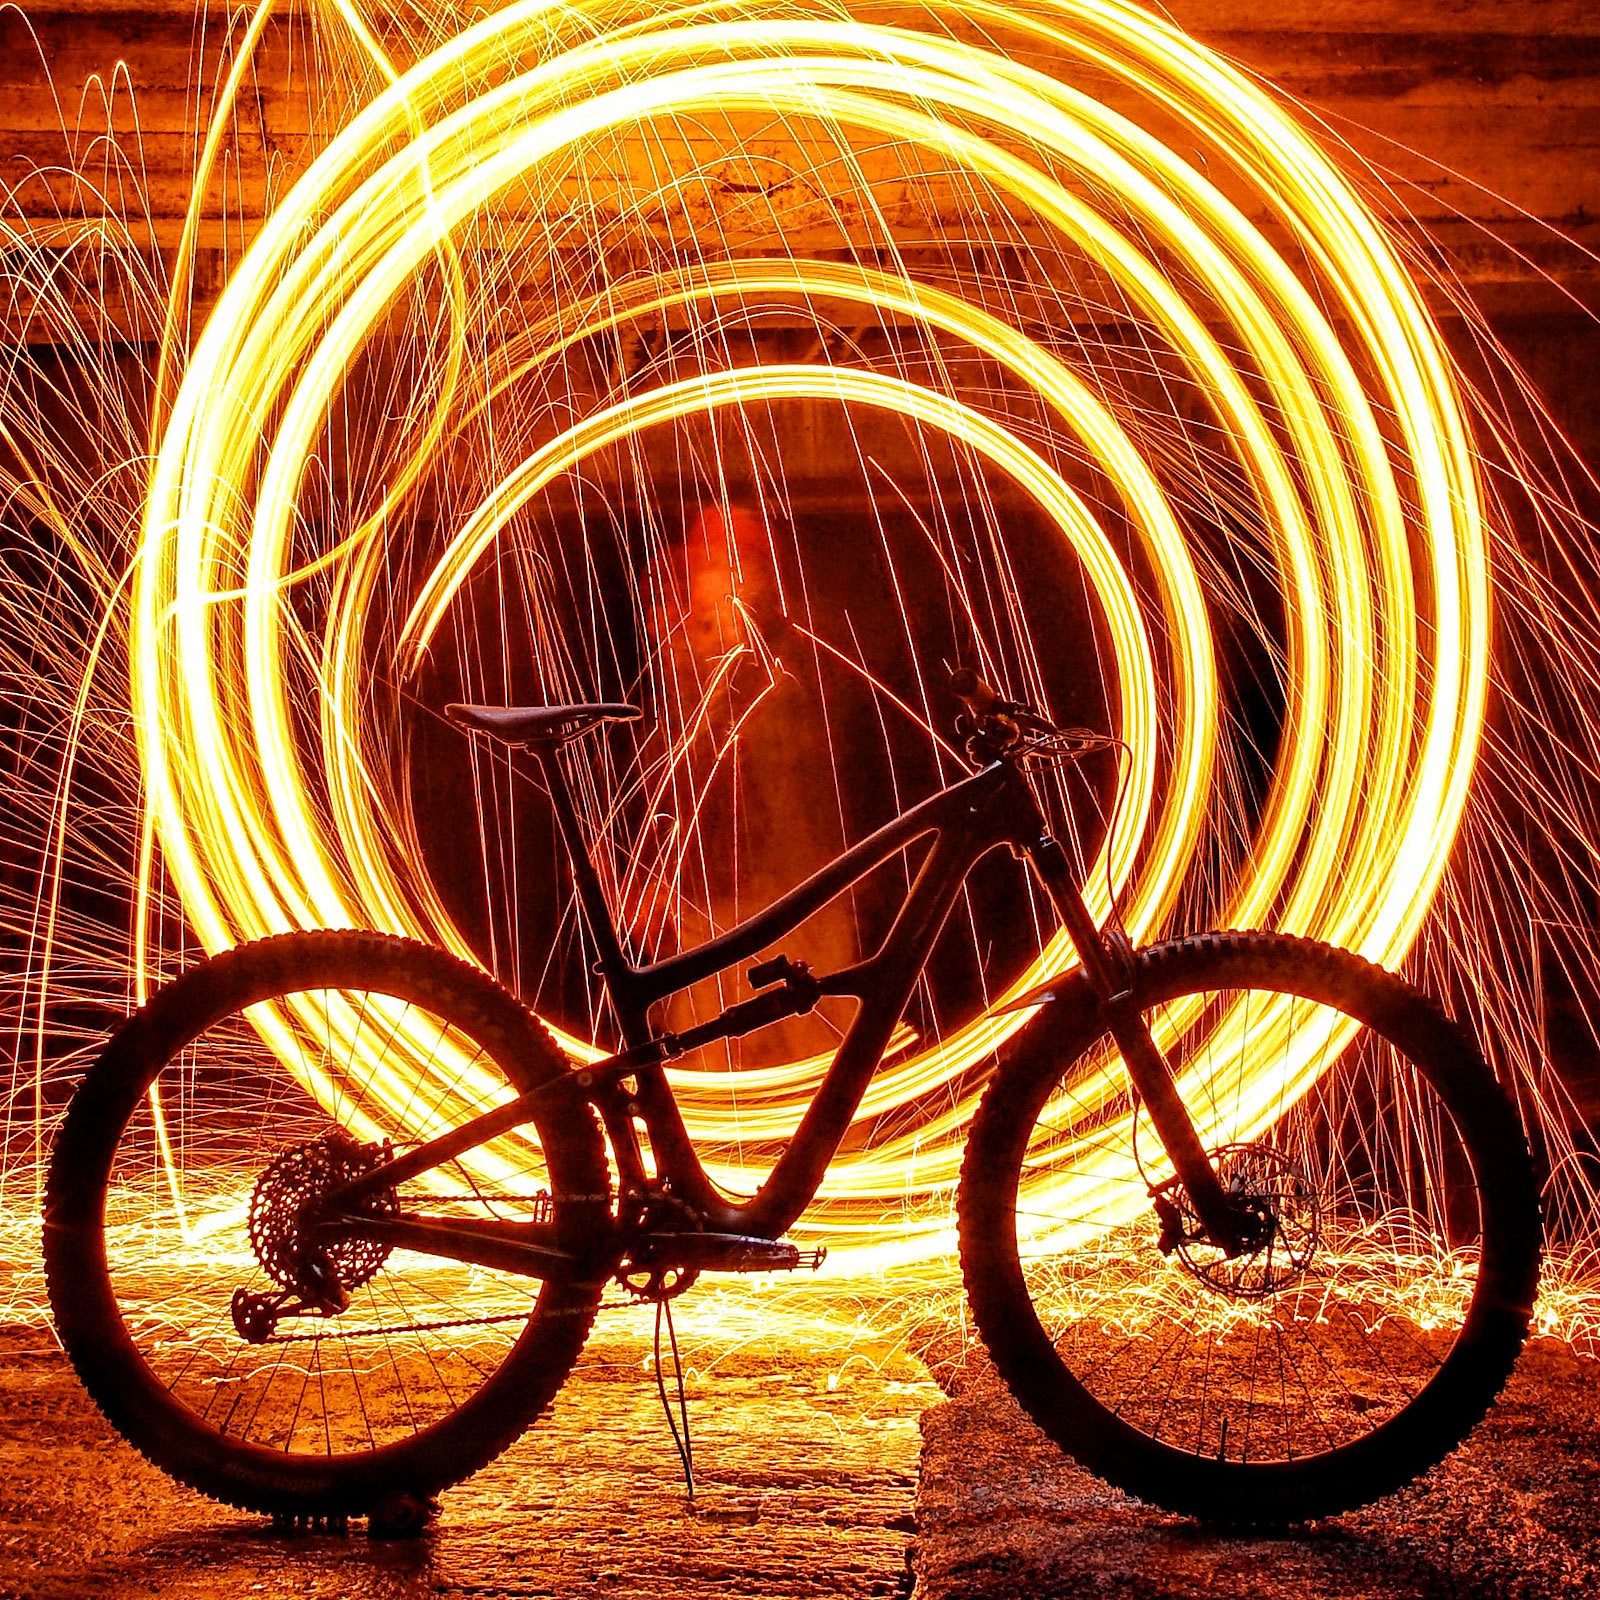 Xmas in July! Celebrating new bike day :-)